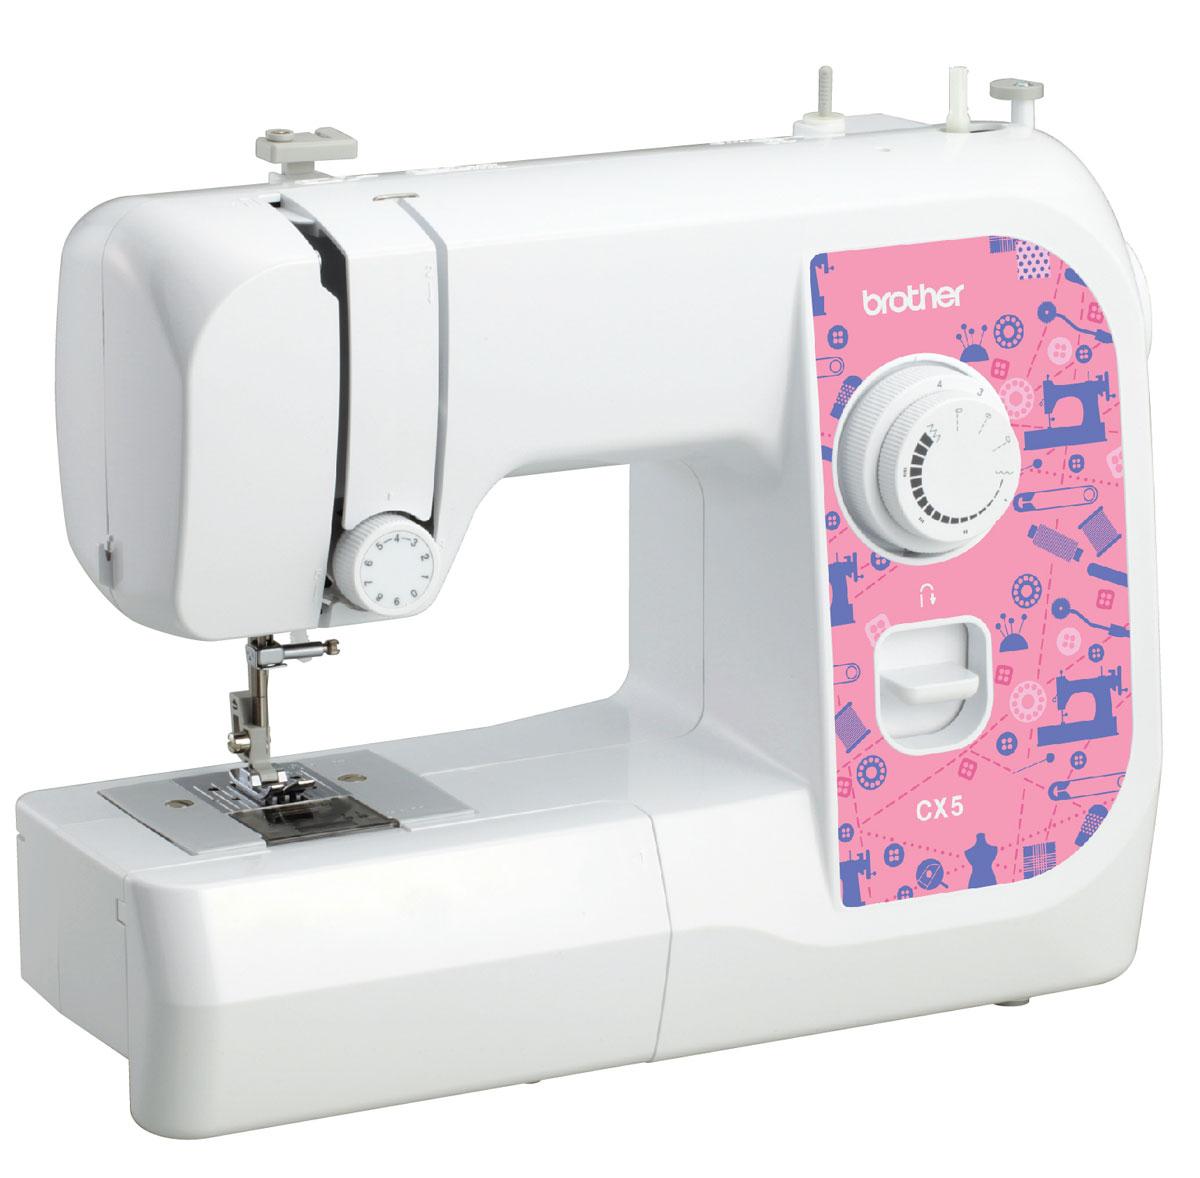 Brother CX5 швейная машина